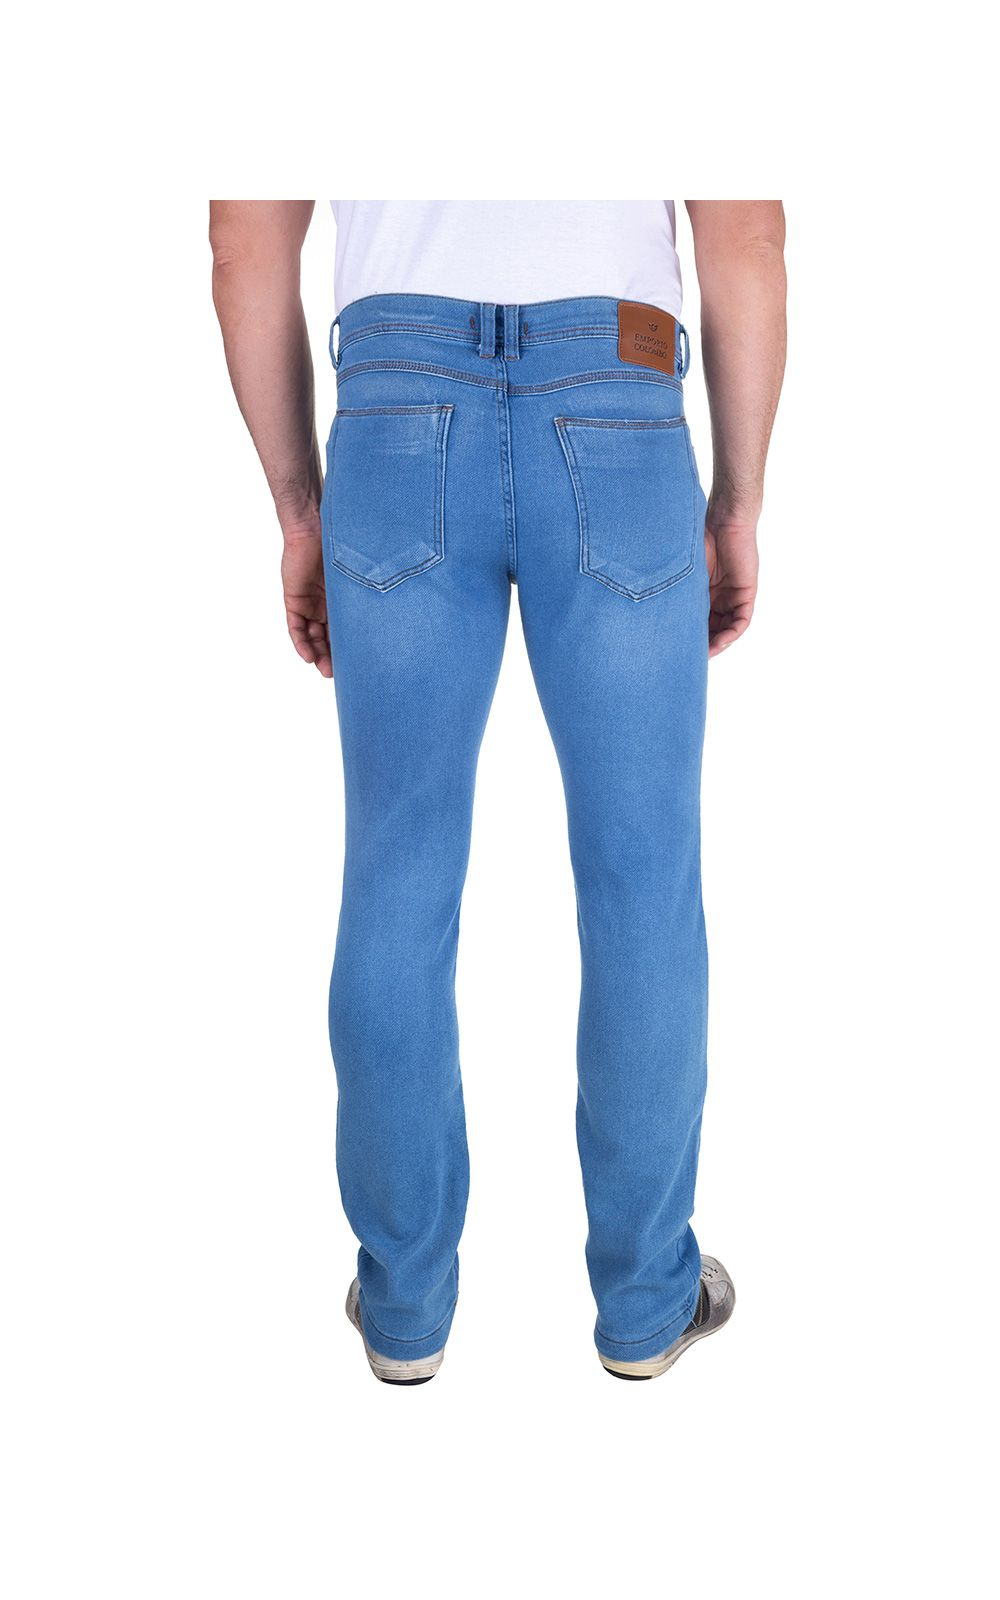 Foto 2 - Calça Jeans Masculina Azul Lisa